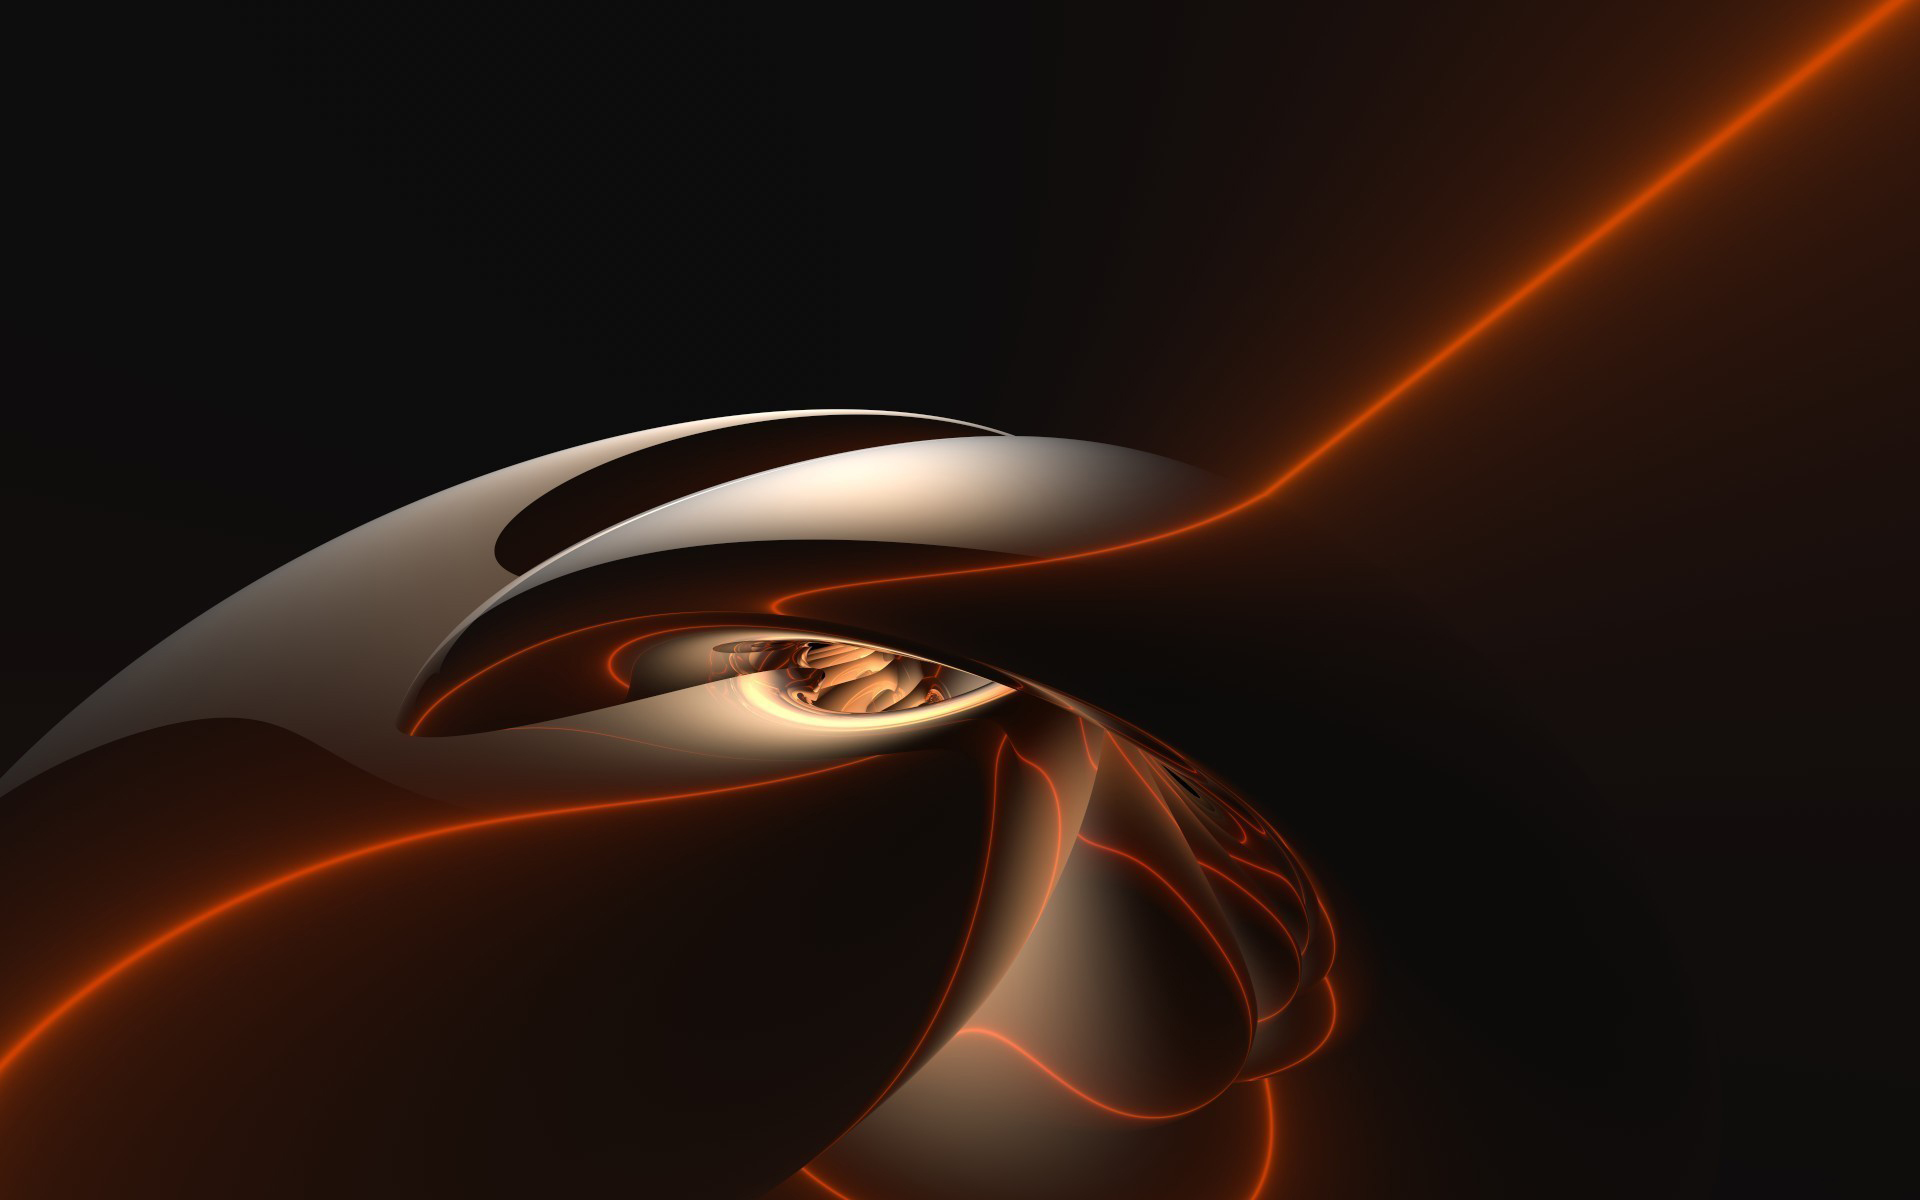 Black and Orange Desktop Wallpaper | PixelsTalk.Net for Cool Orange And Black Abstract Backgrounds  103wja